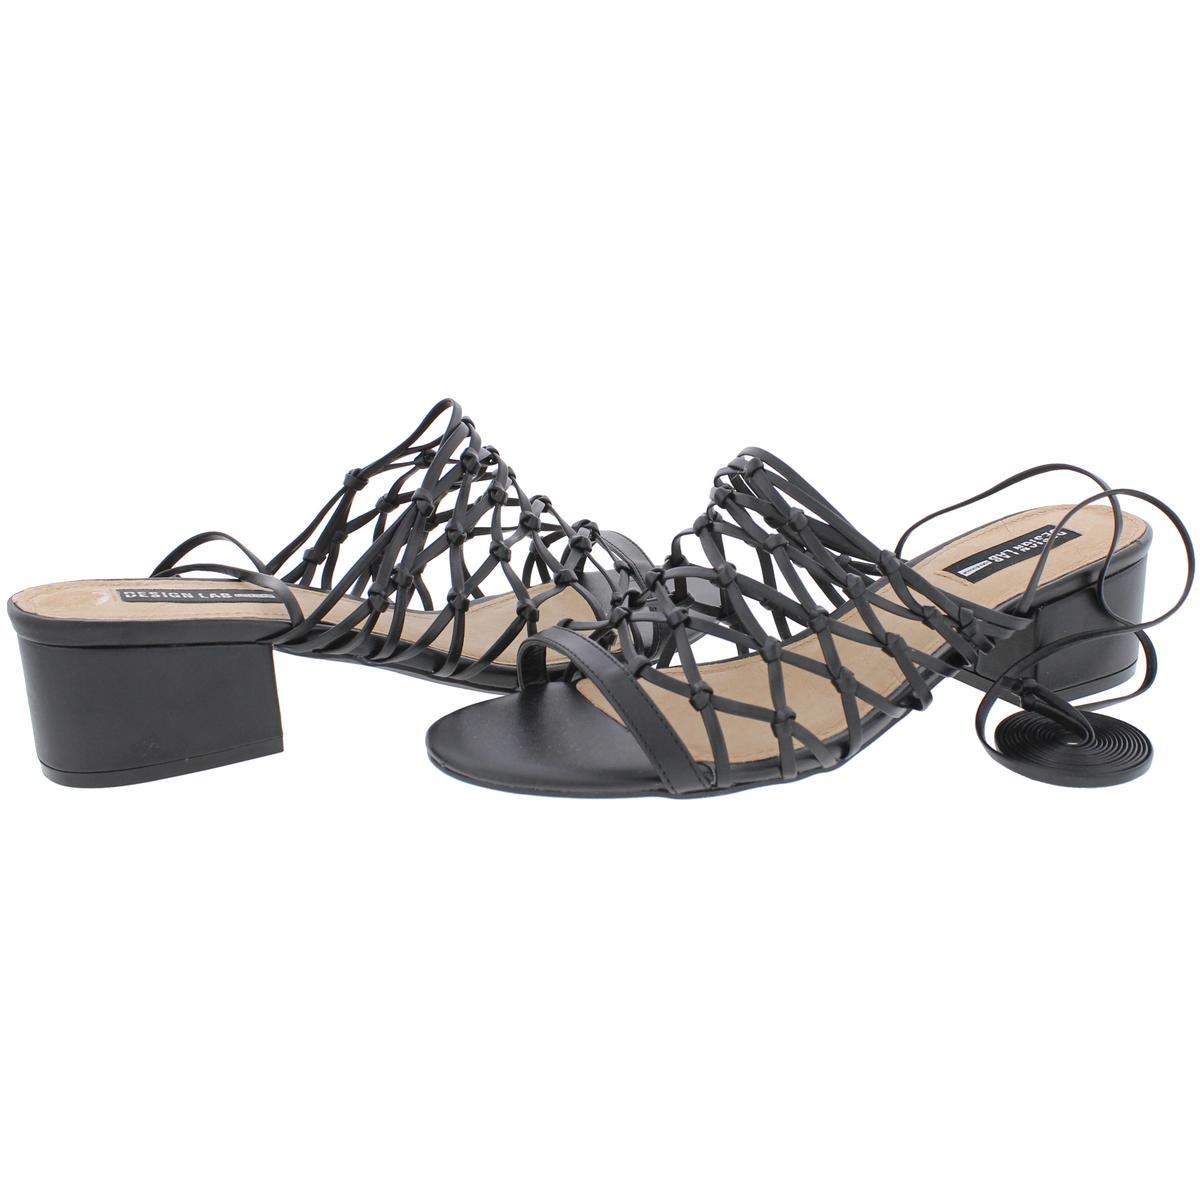 Design-Lab-Womens-Mya-Wrap-Open-Toe-Dress-Heels-Shoes-BHFO-2941 thumbnail 7